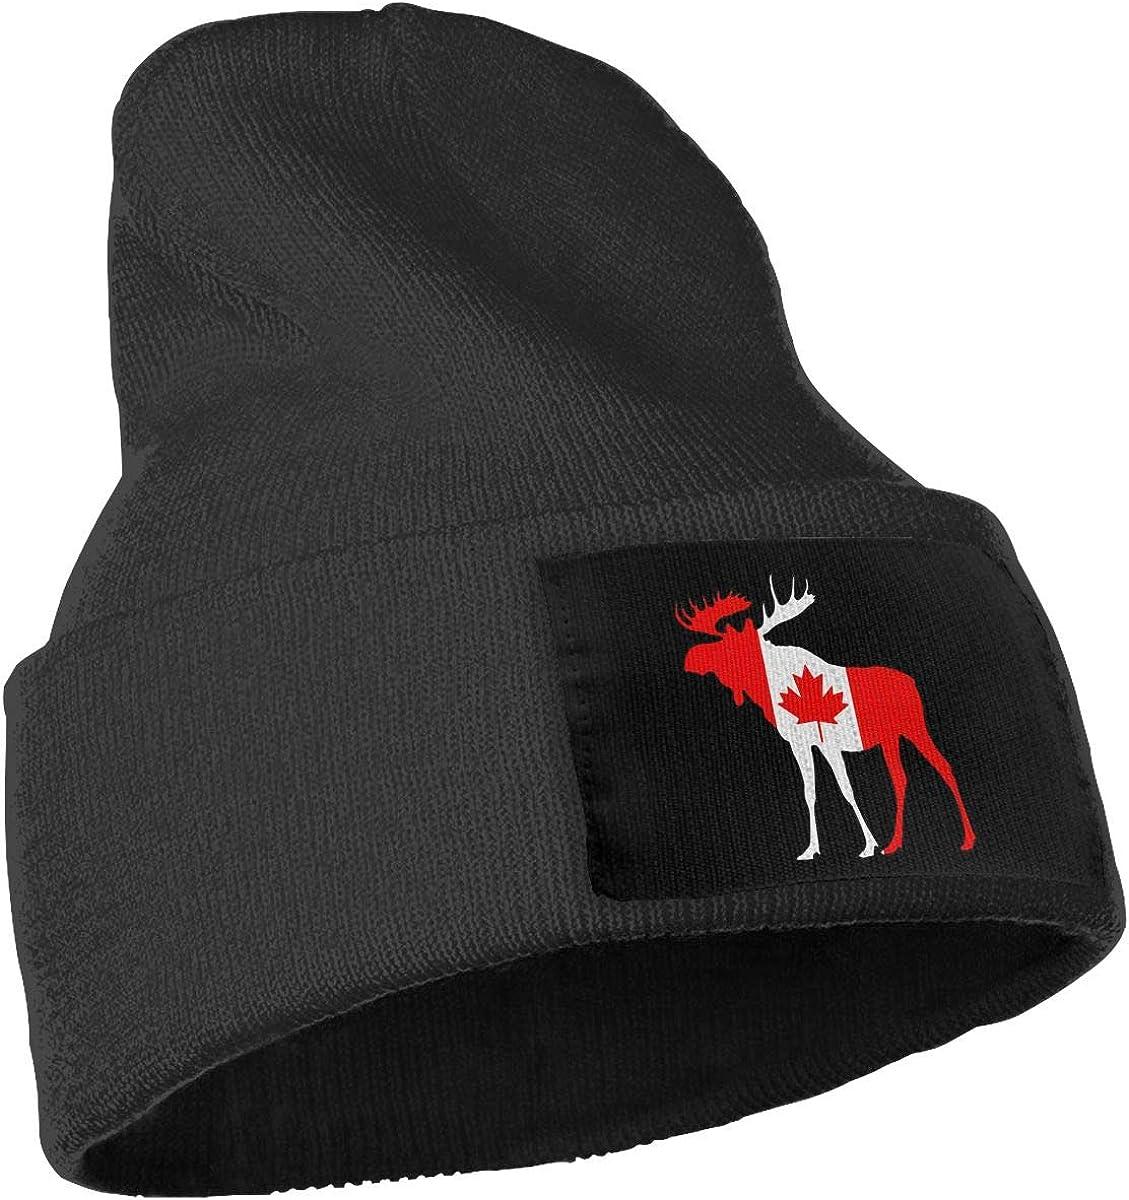 COLLJL-8 Men//Women Canada Flag Moose Outdoor Fashion Knit Beanies Hat Soft Winter Knit Caps